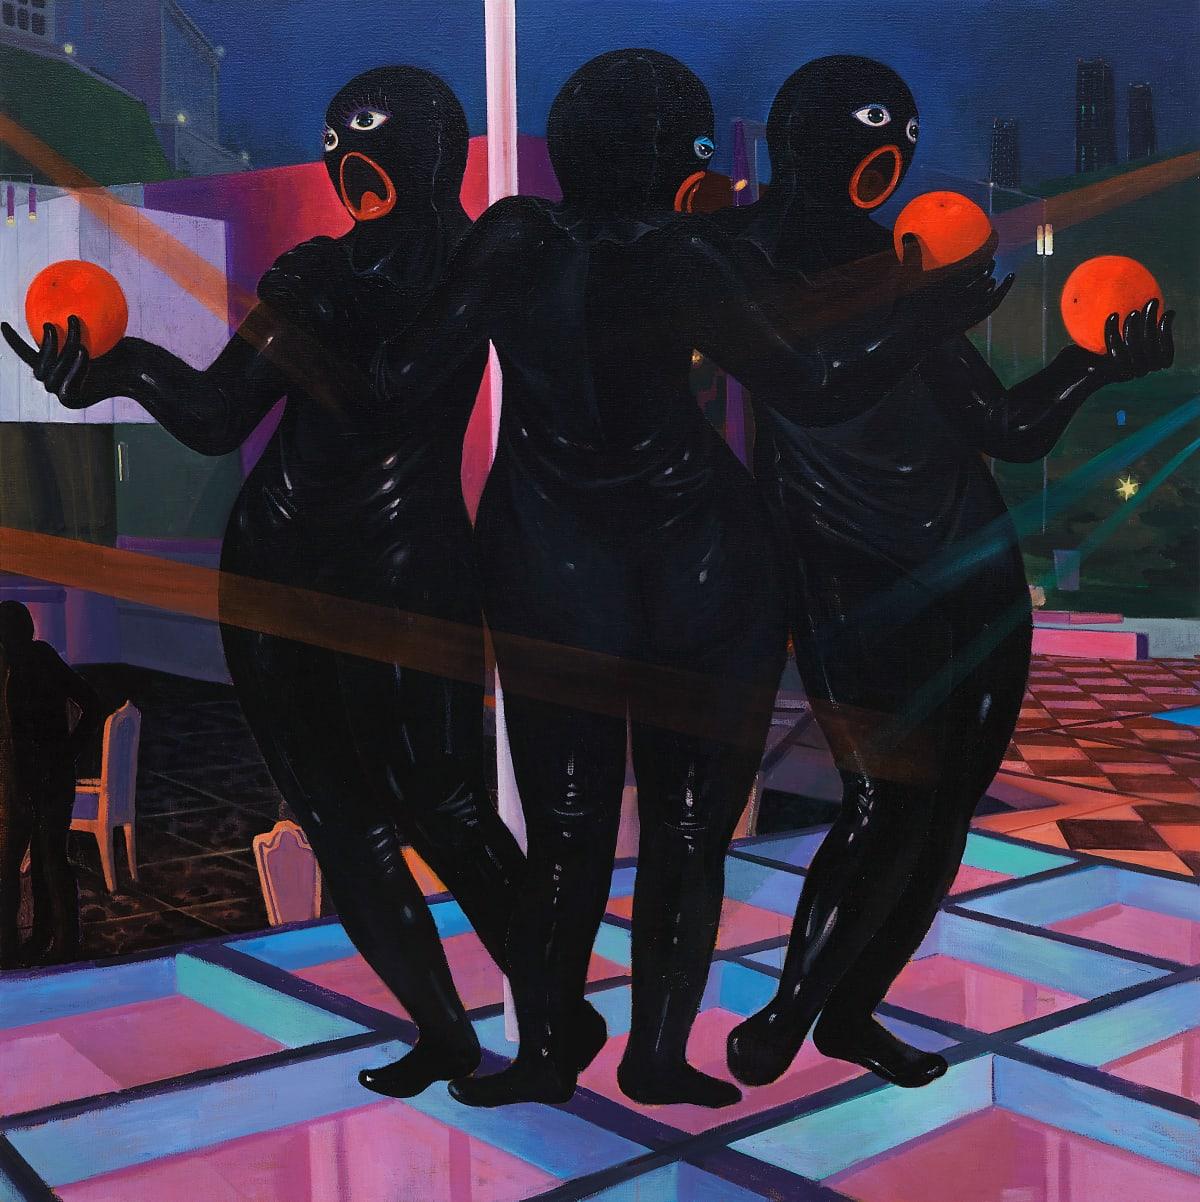 CAI ZEBIN, Revisit, 2019, acrylic on canvas, 215 × 215 cm